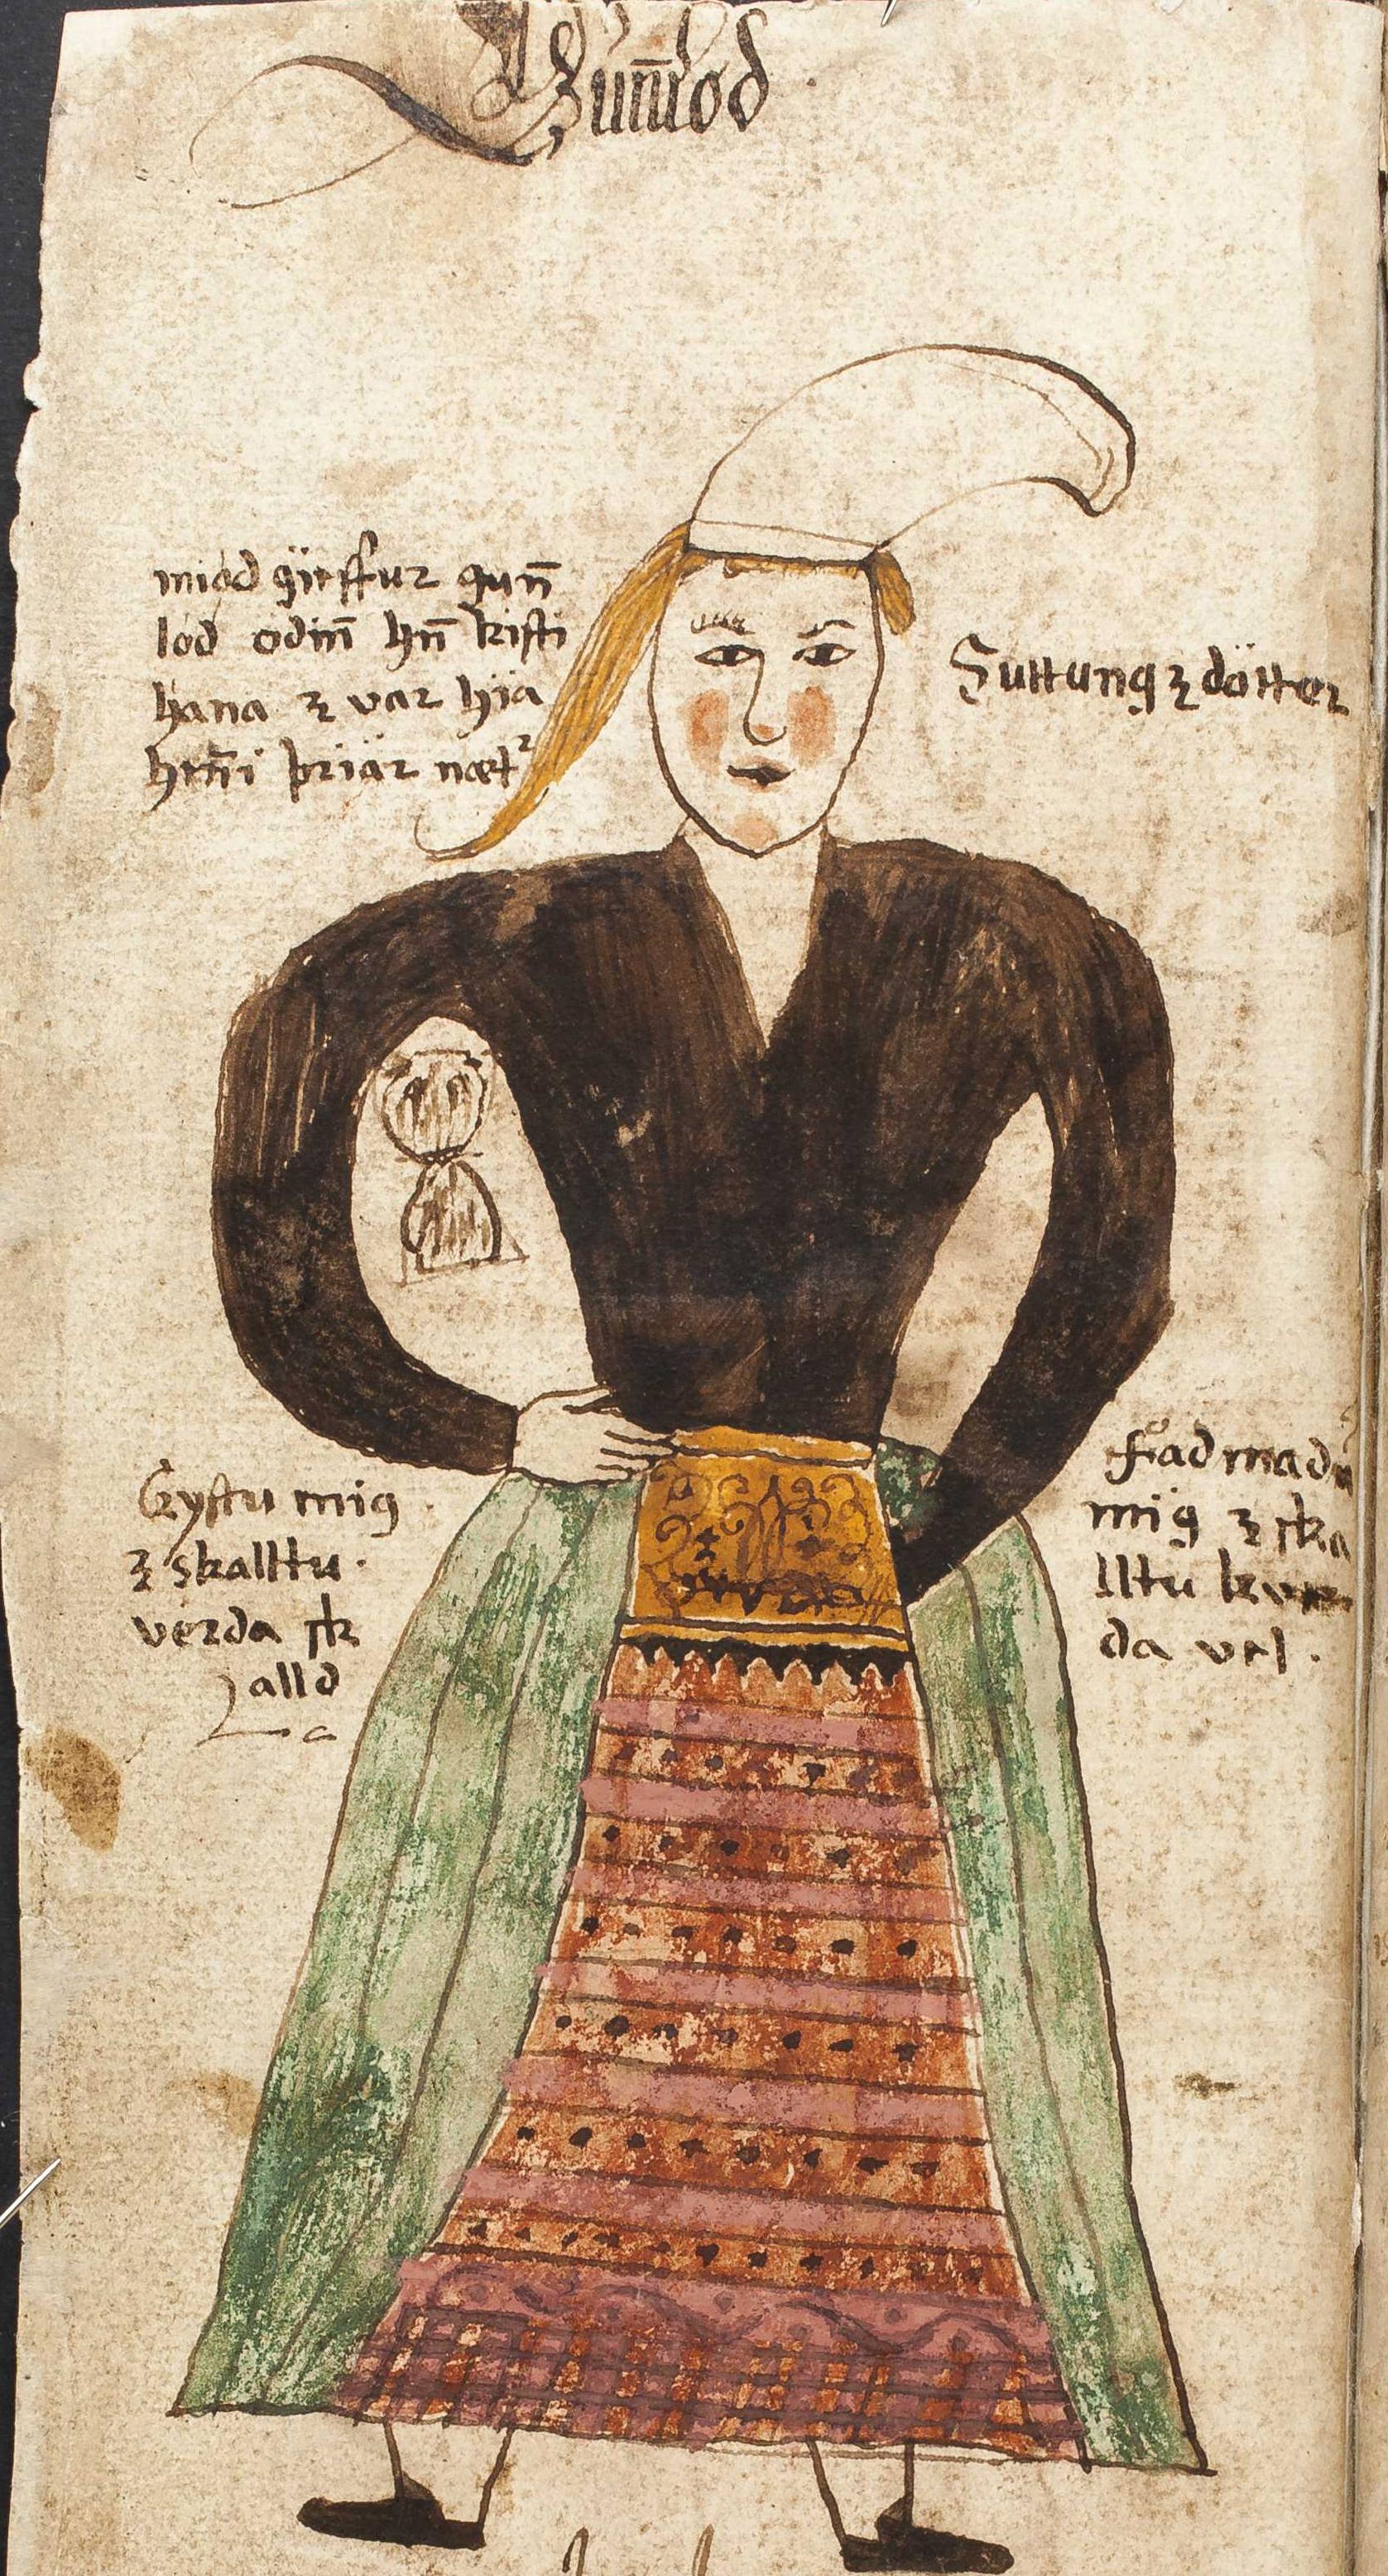 Gunnlöð the Giant´s Daughter